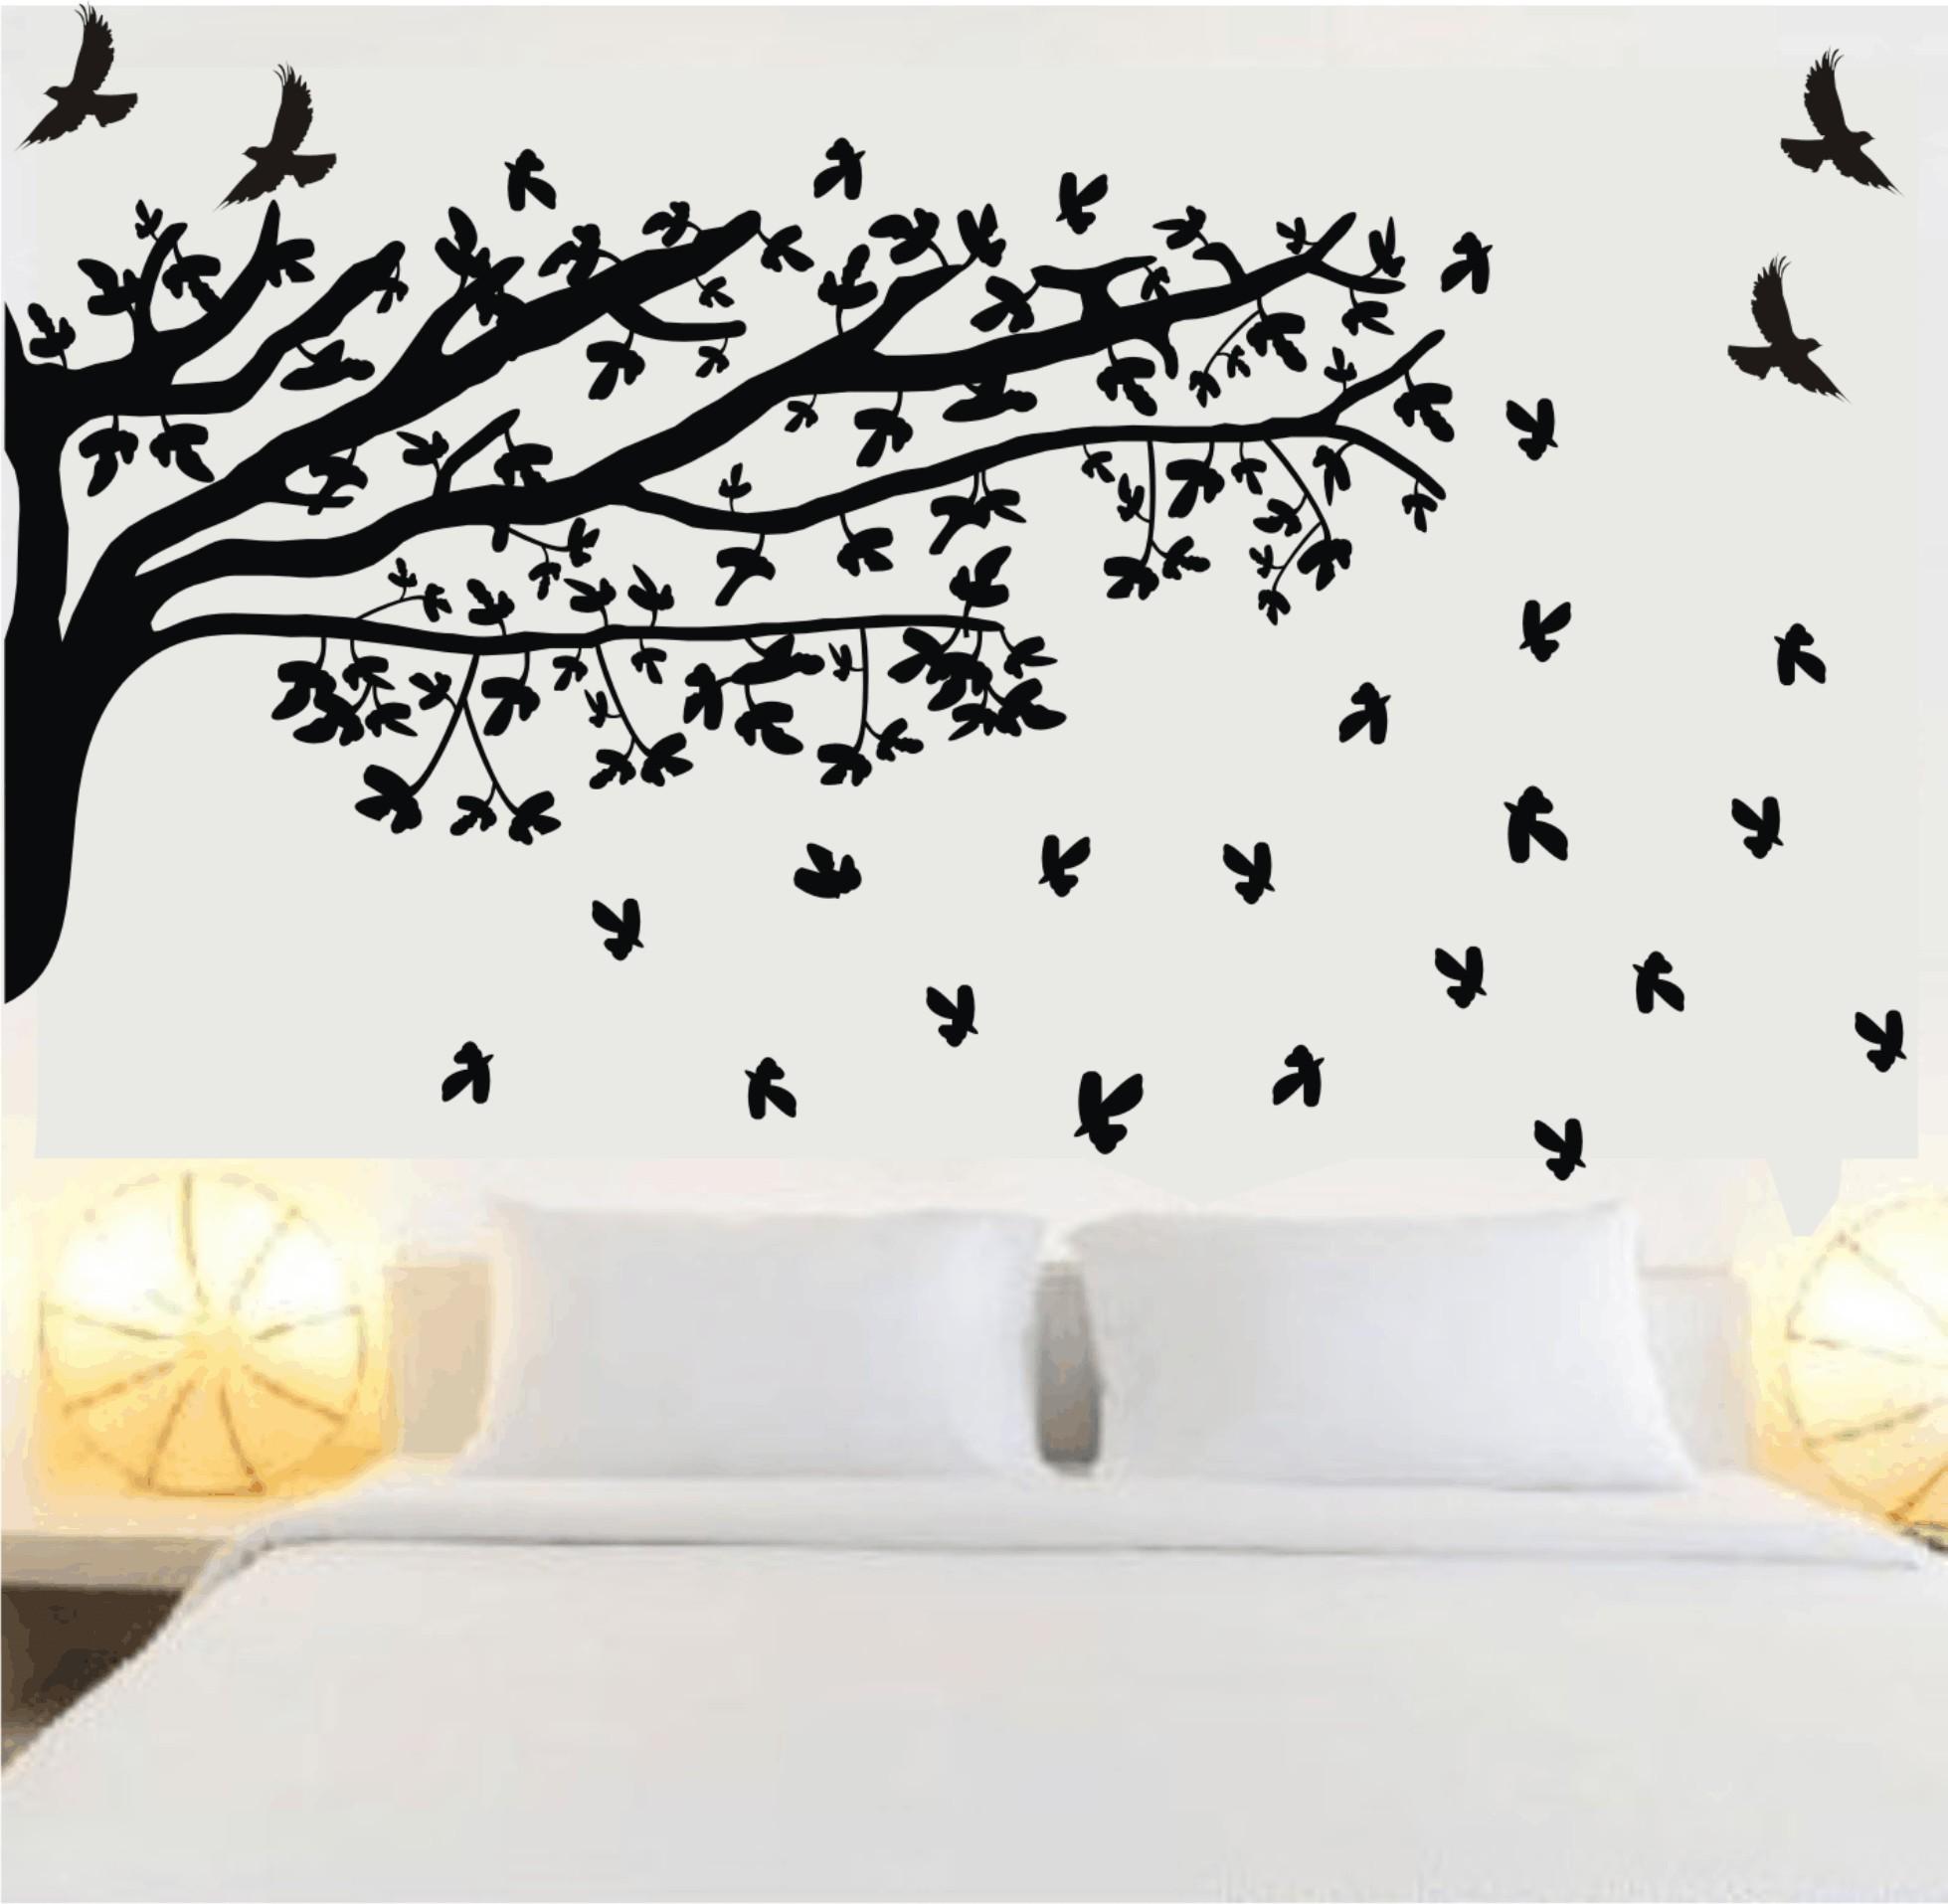 Adesivos Decorativos De Parede De Rvores Para Sala E Quartos  -> Adesivo Para Decoracao De Sala